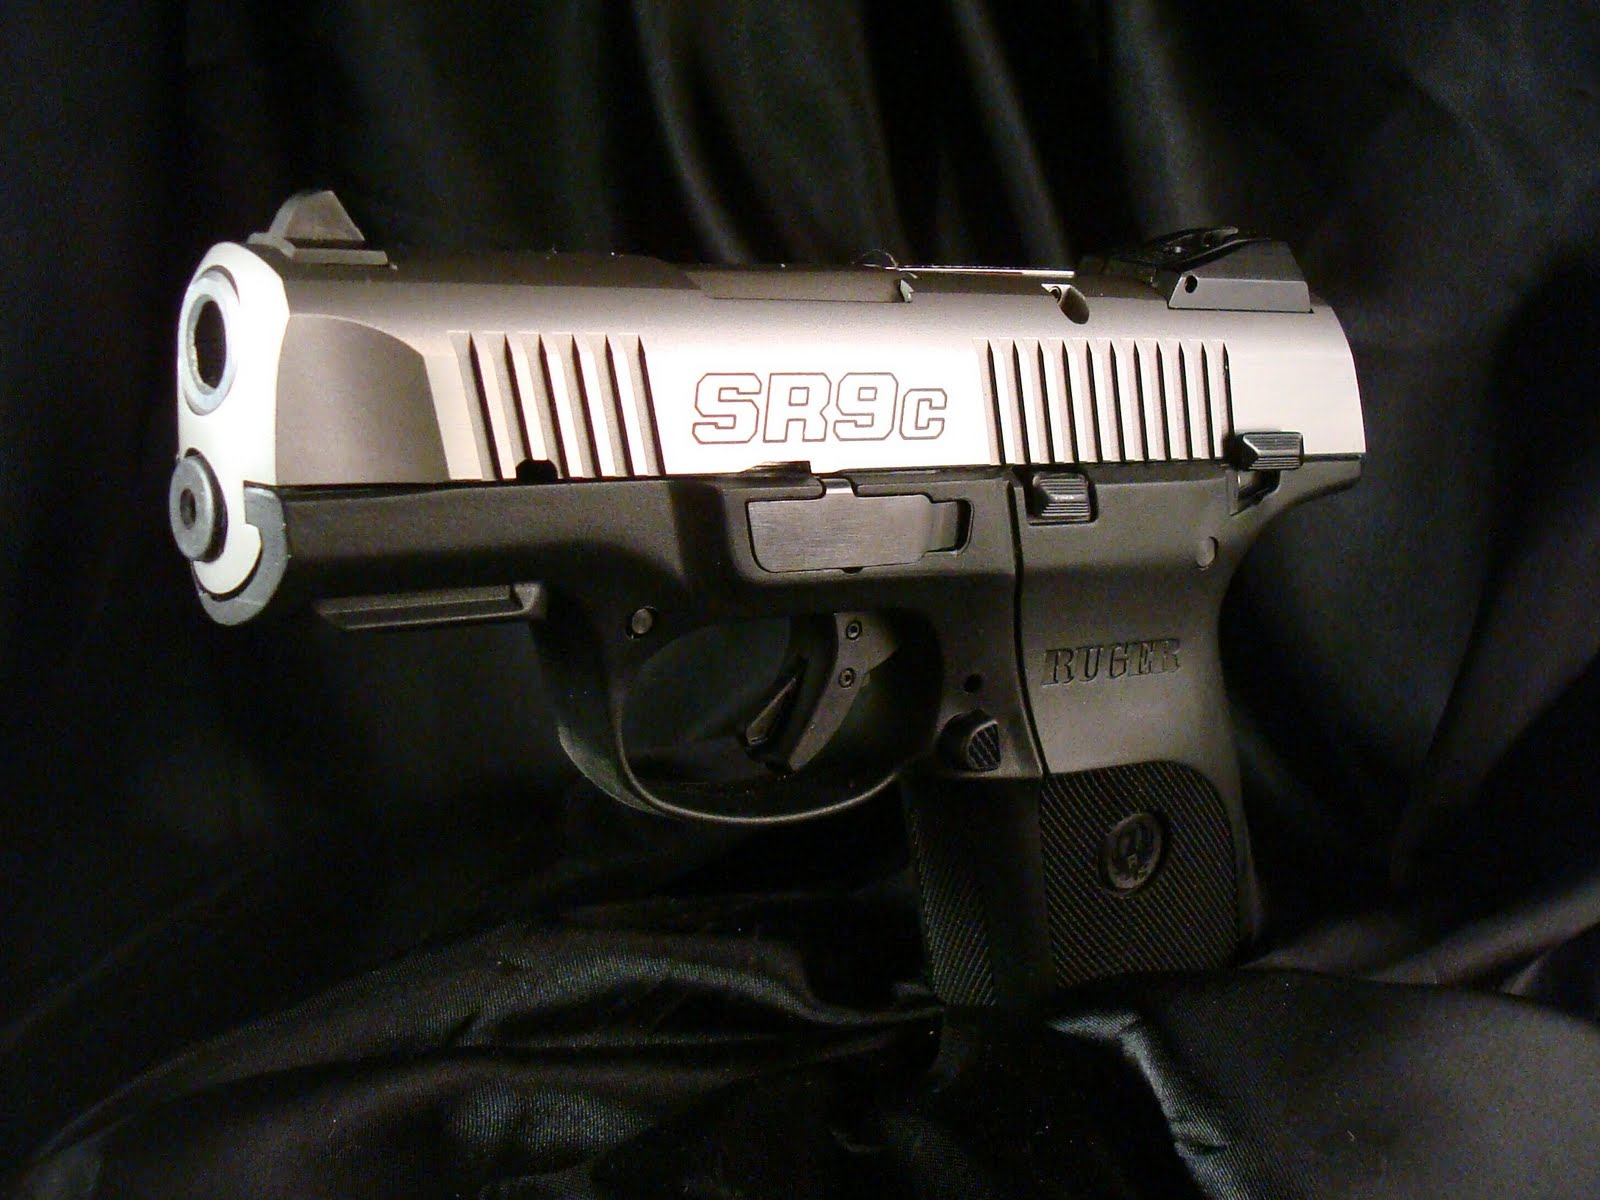 Average Joe's Handgun Reviews: Ruger SR9c Compact 9mm